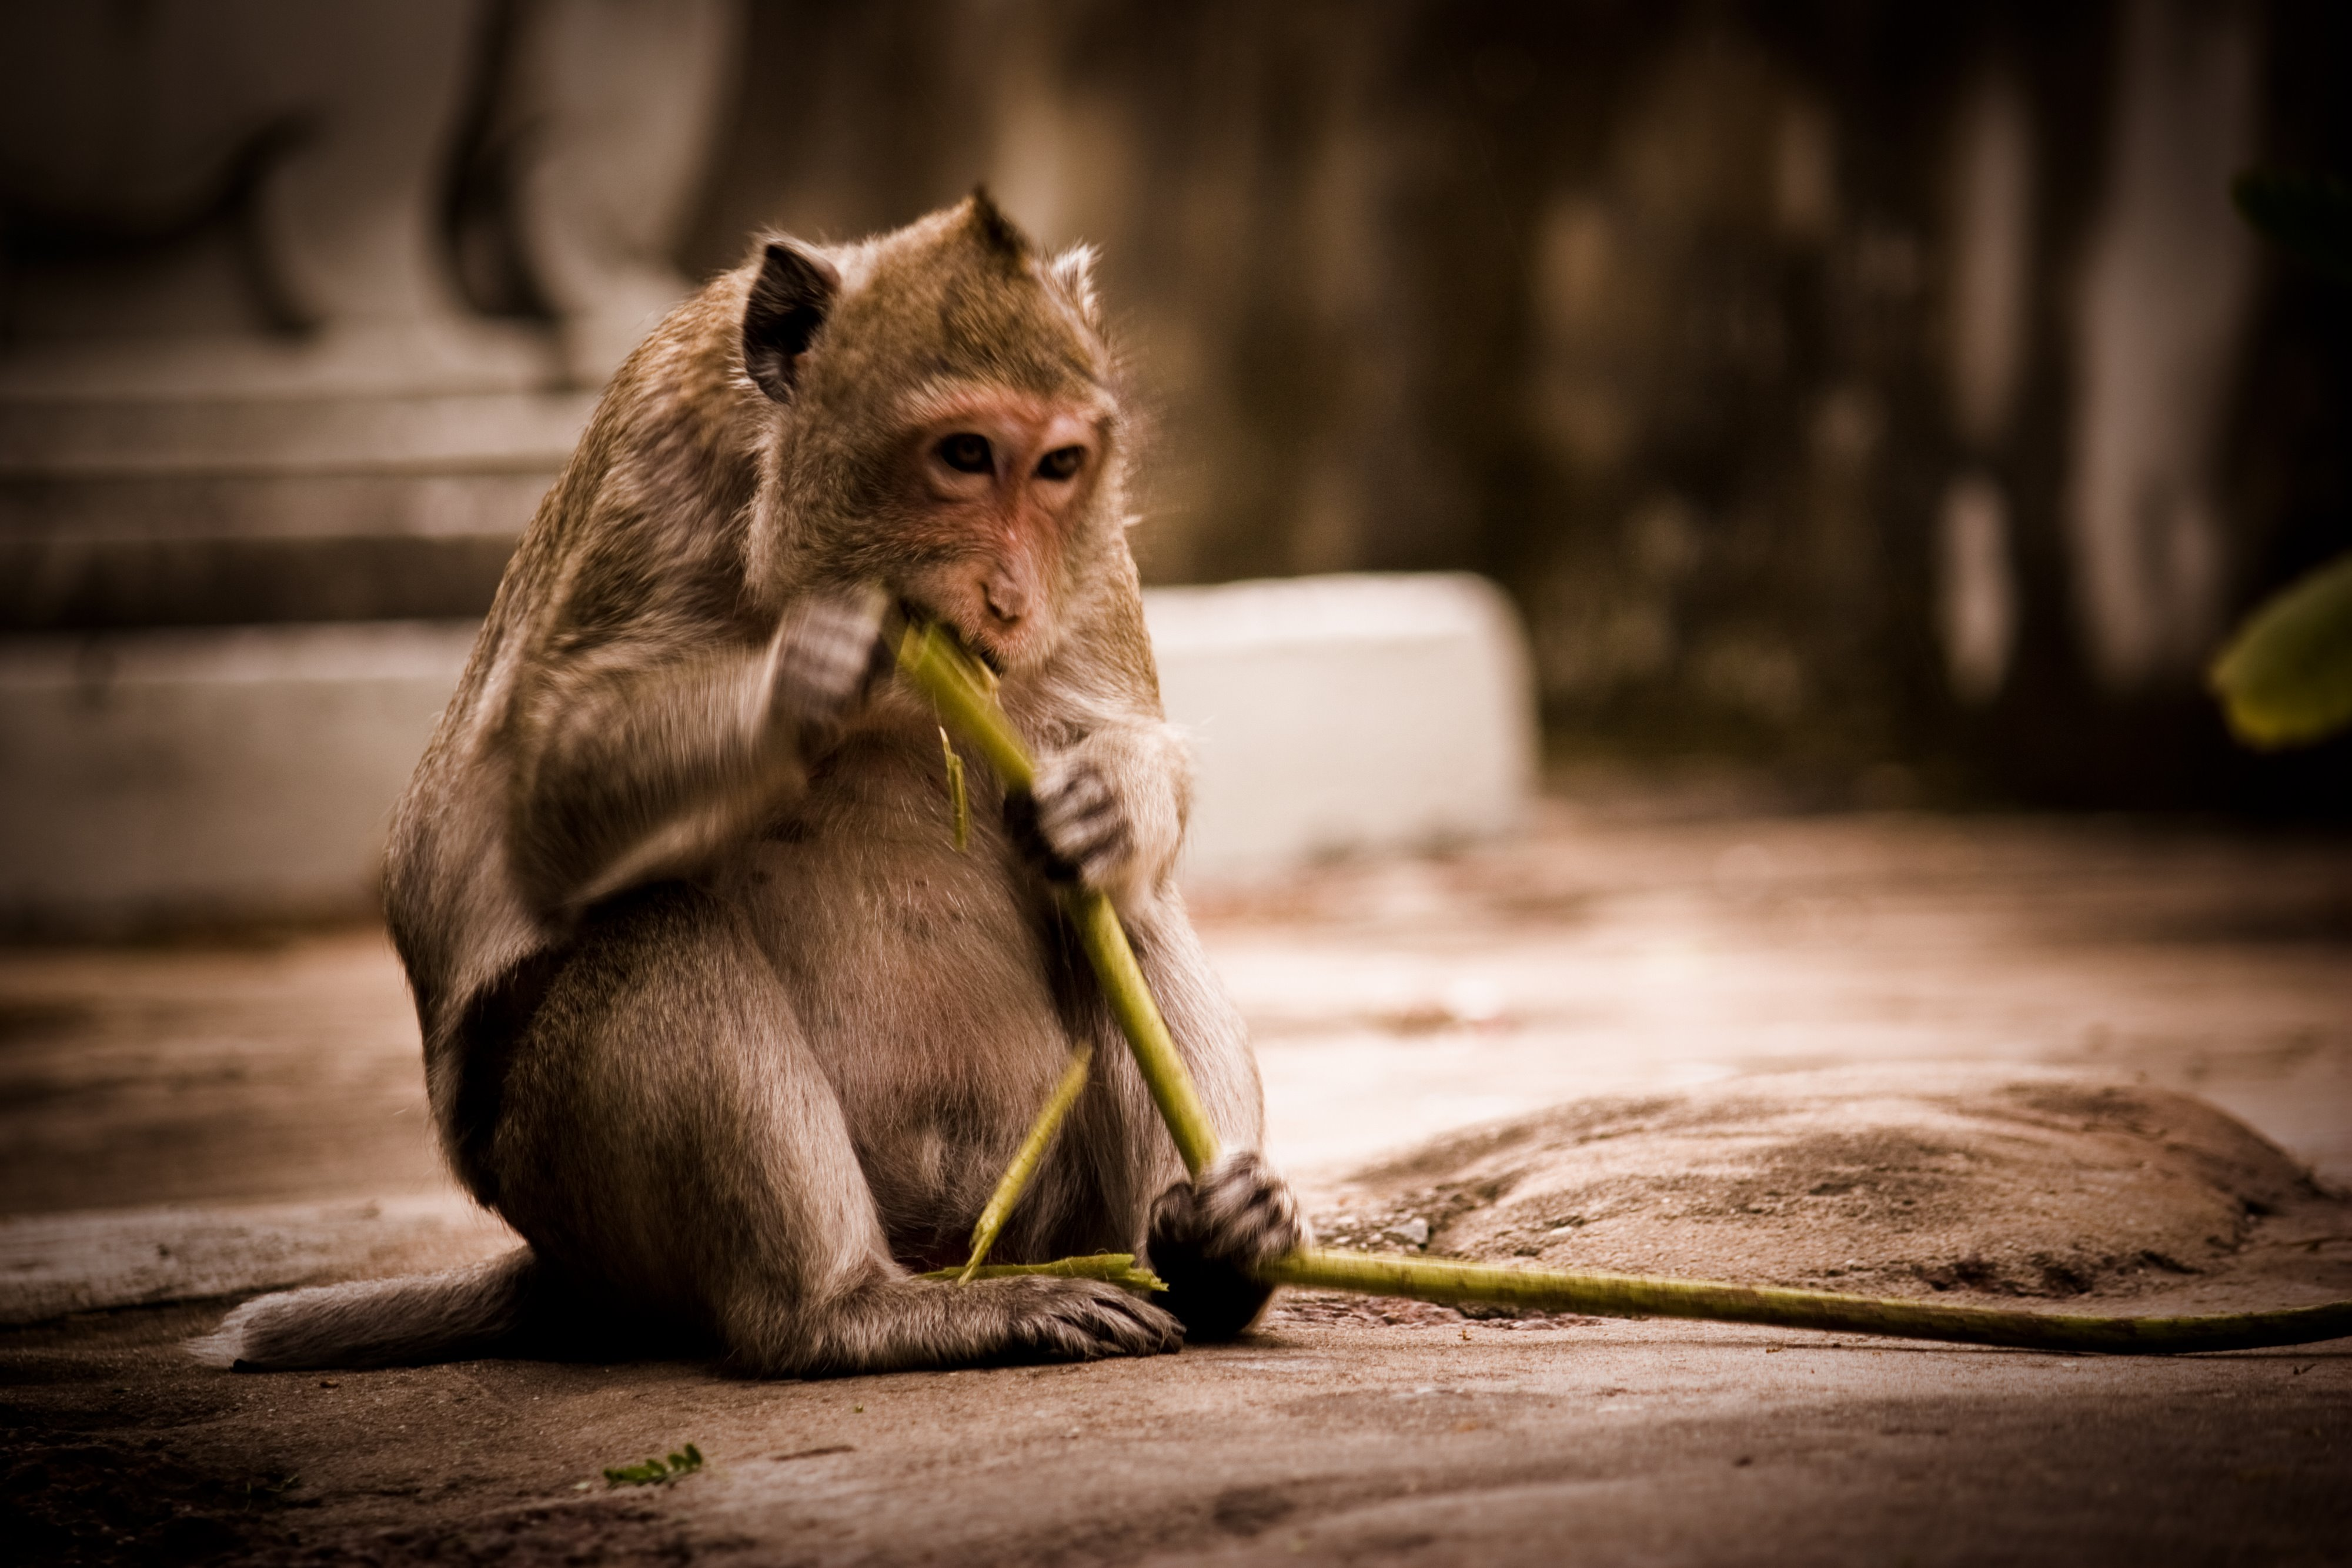 Monkey Eating in Cambodia at Wat Phnom